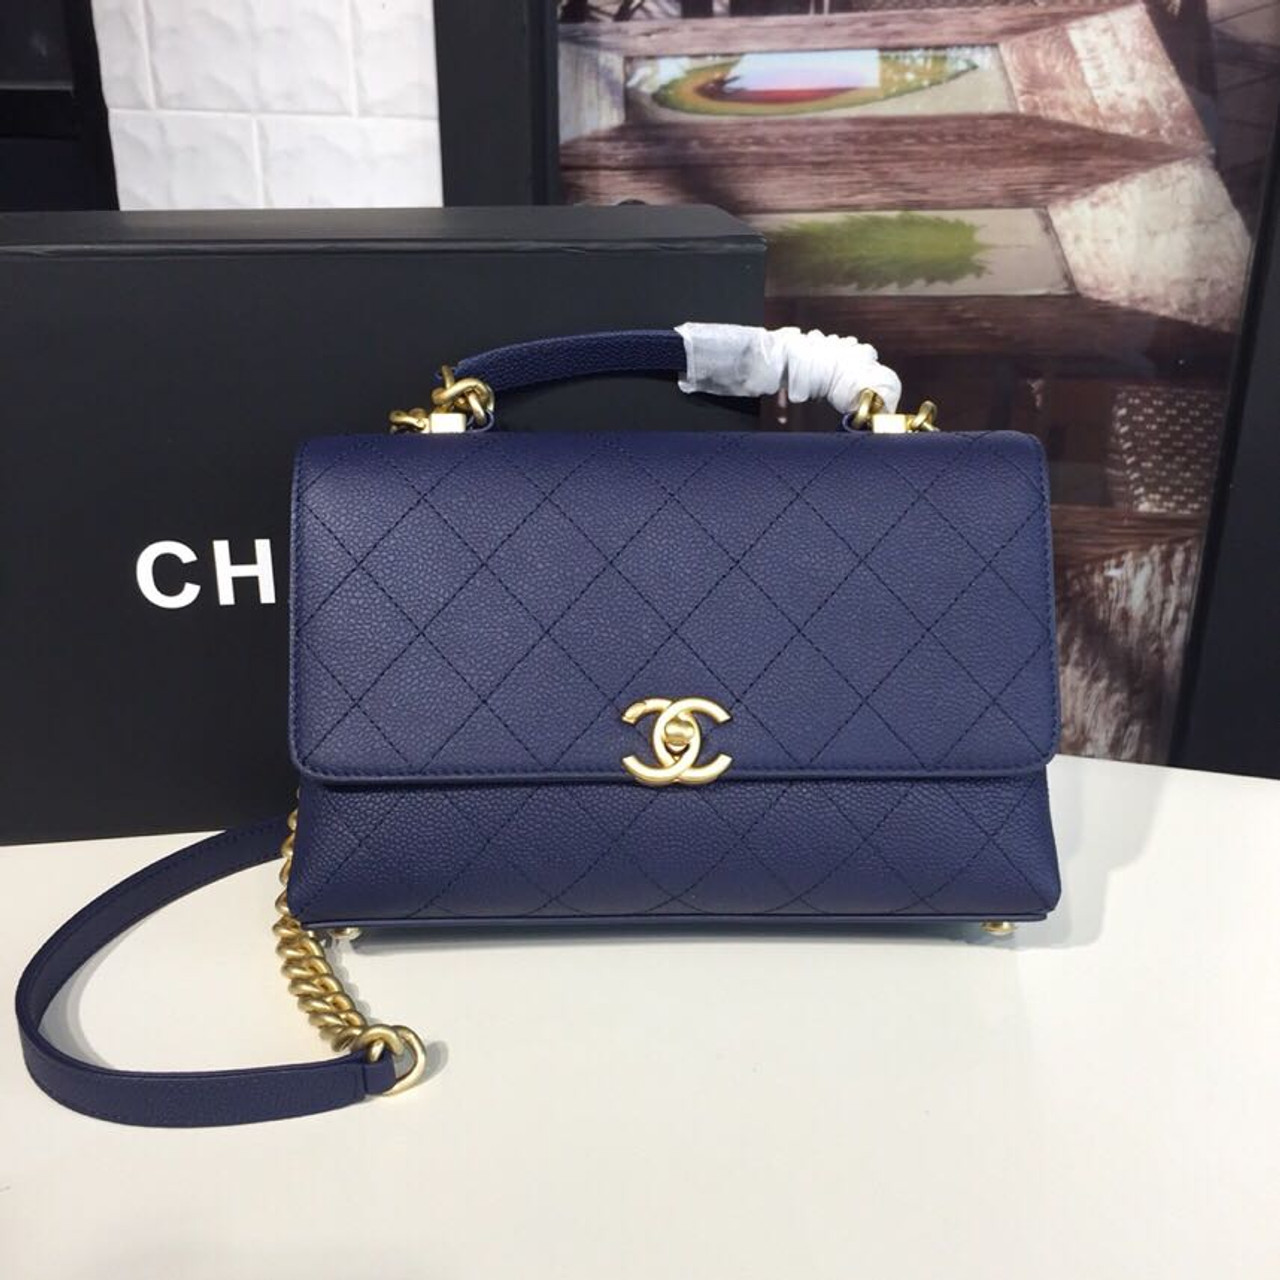 Chanel Flap Bag Medium 24cm Grained Calfskin Leather ...